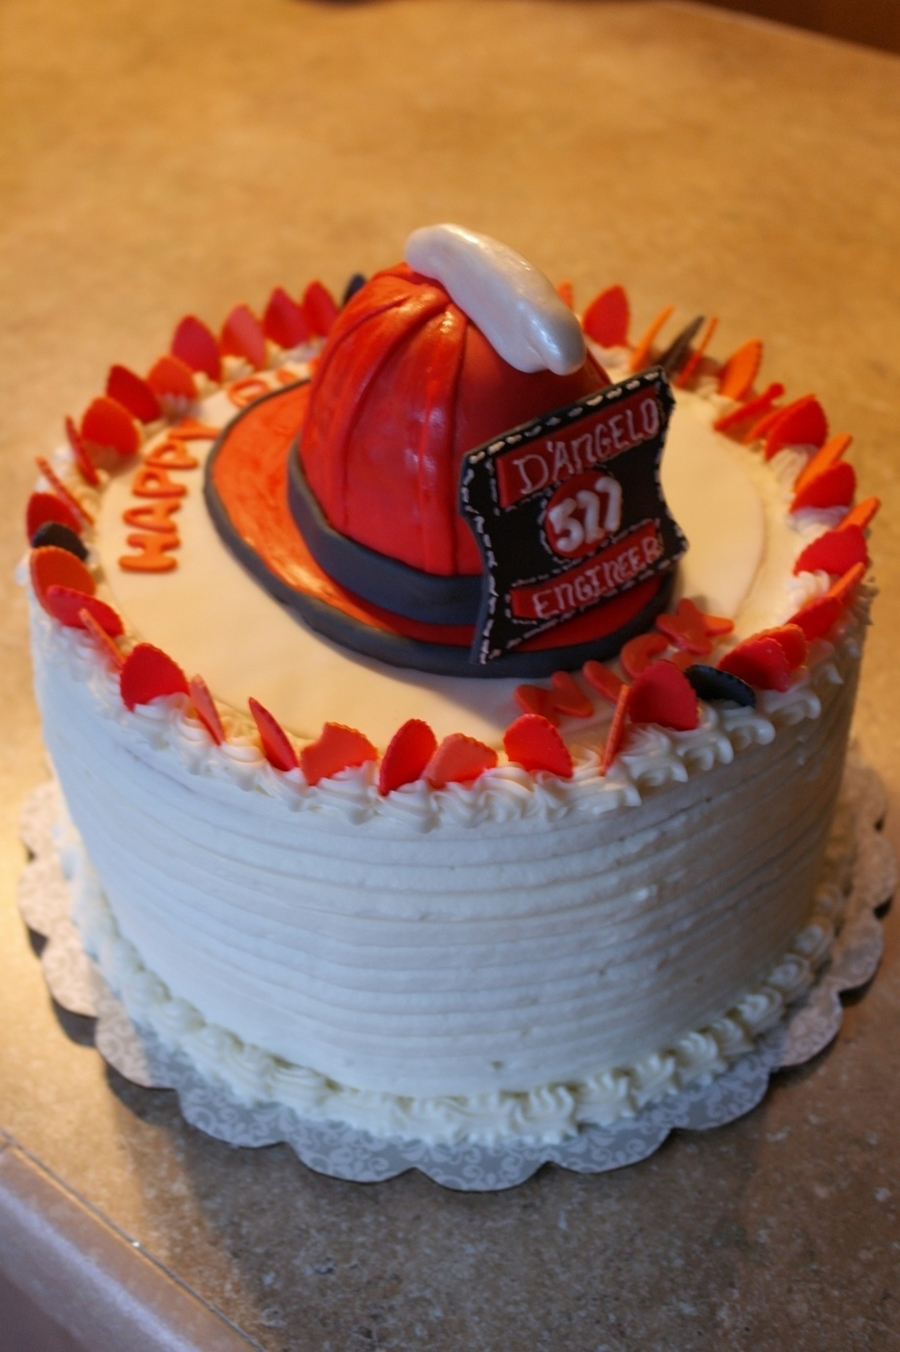 Enjoyable Fireman Birthday Cake Cakecentral Com Funny Birthday Cards Online Elaedamsfinfo